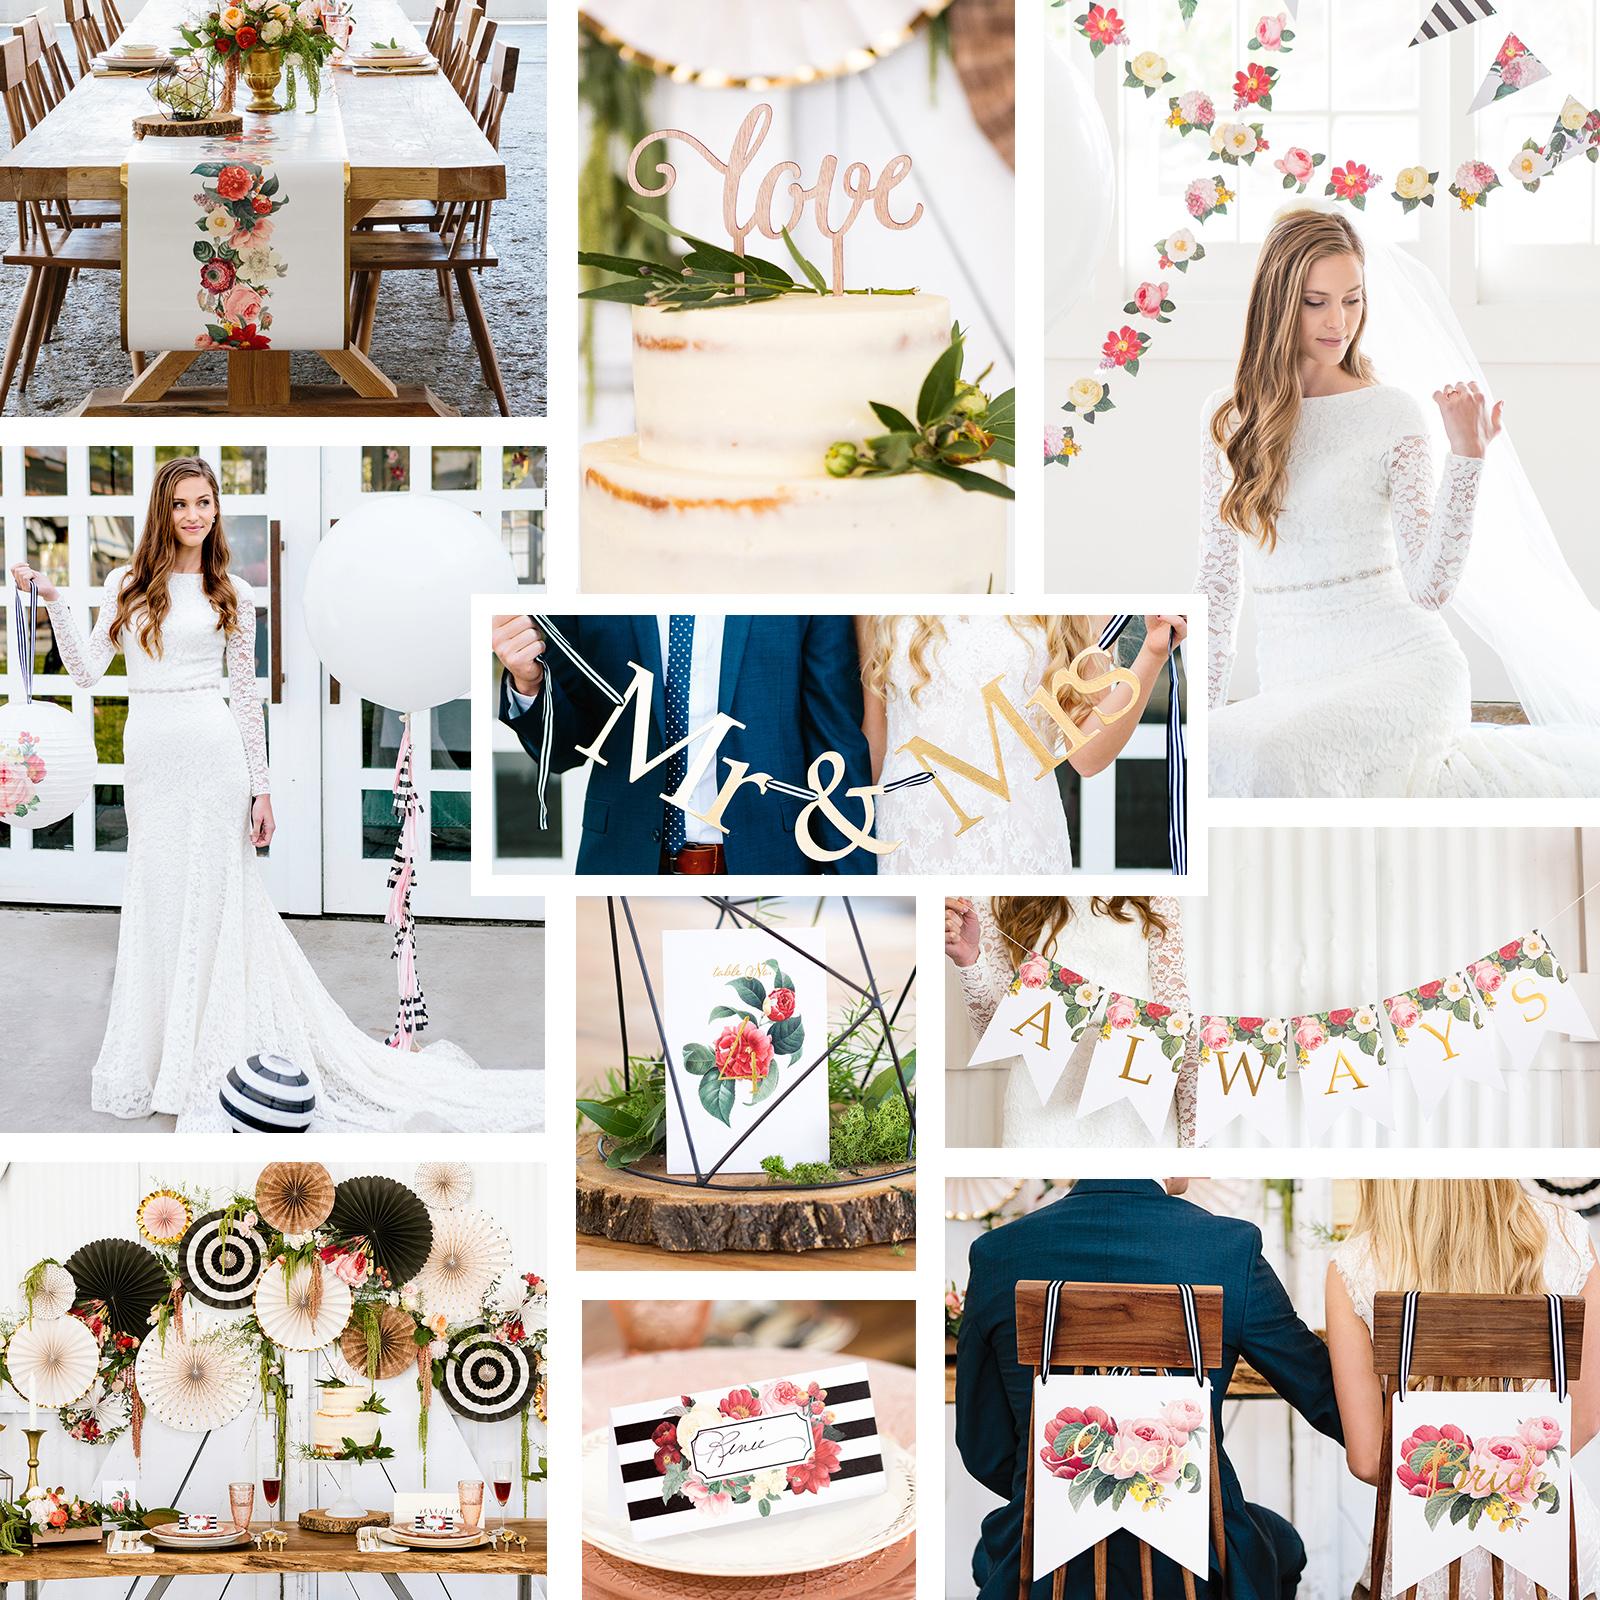 My Mind's Eye Botanical Wedding - Head/Guest/Cake Table D...